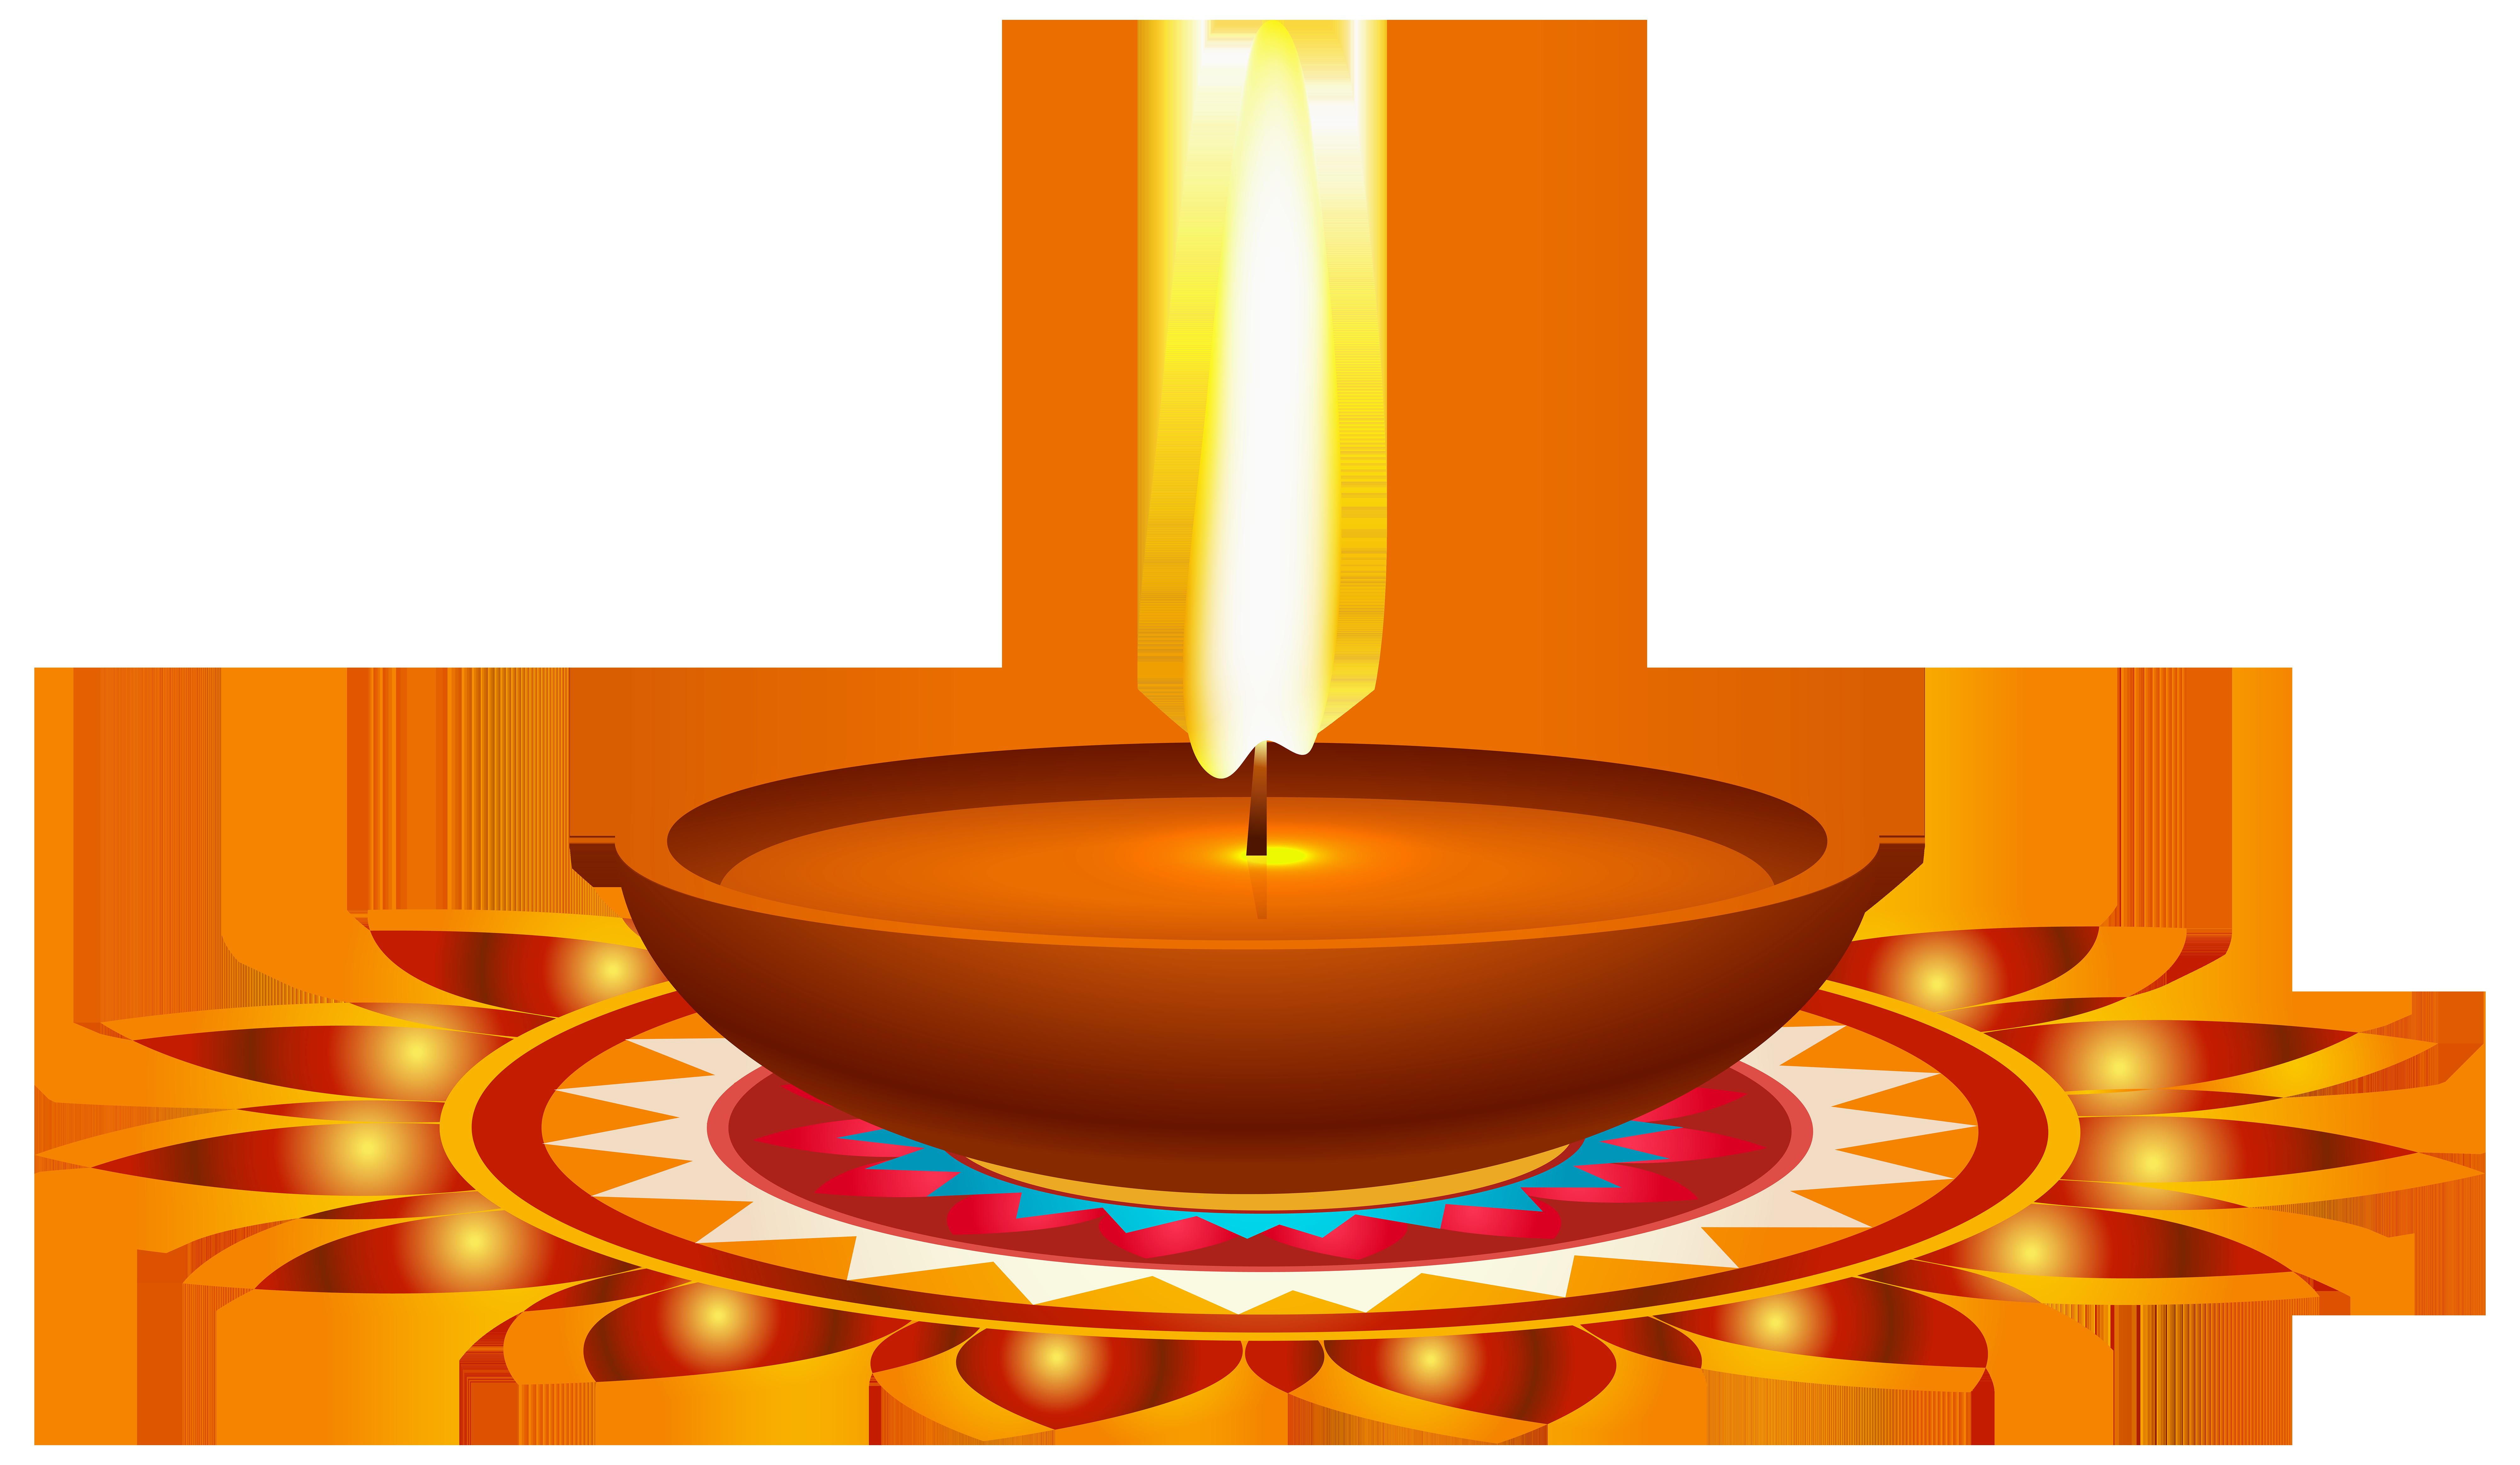 8000x4650 Diwali Candle Png Clip Art Imageu200b Gallery Yopriceville